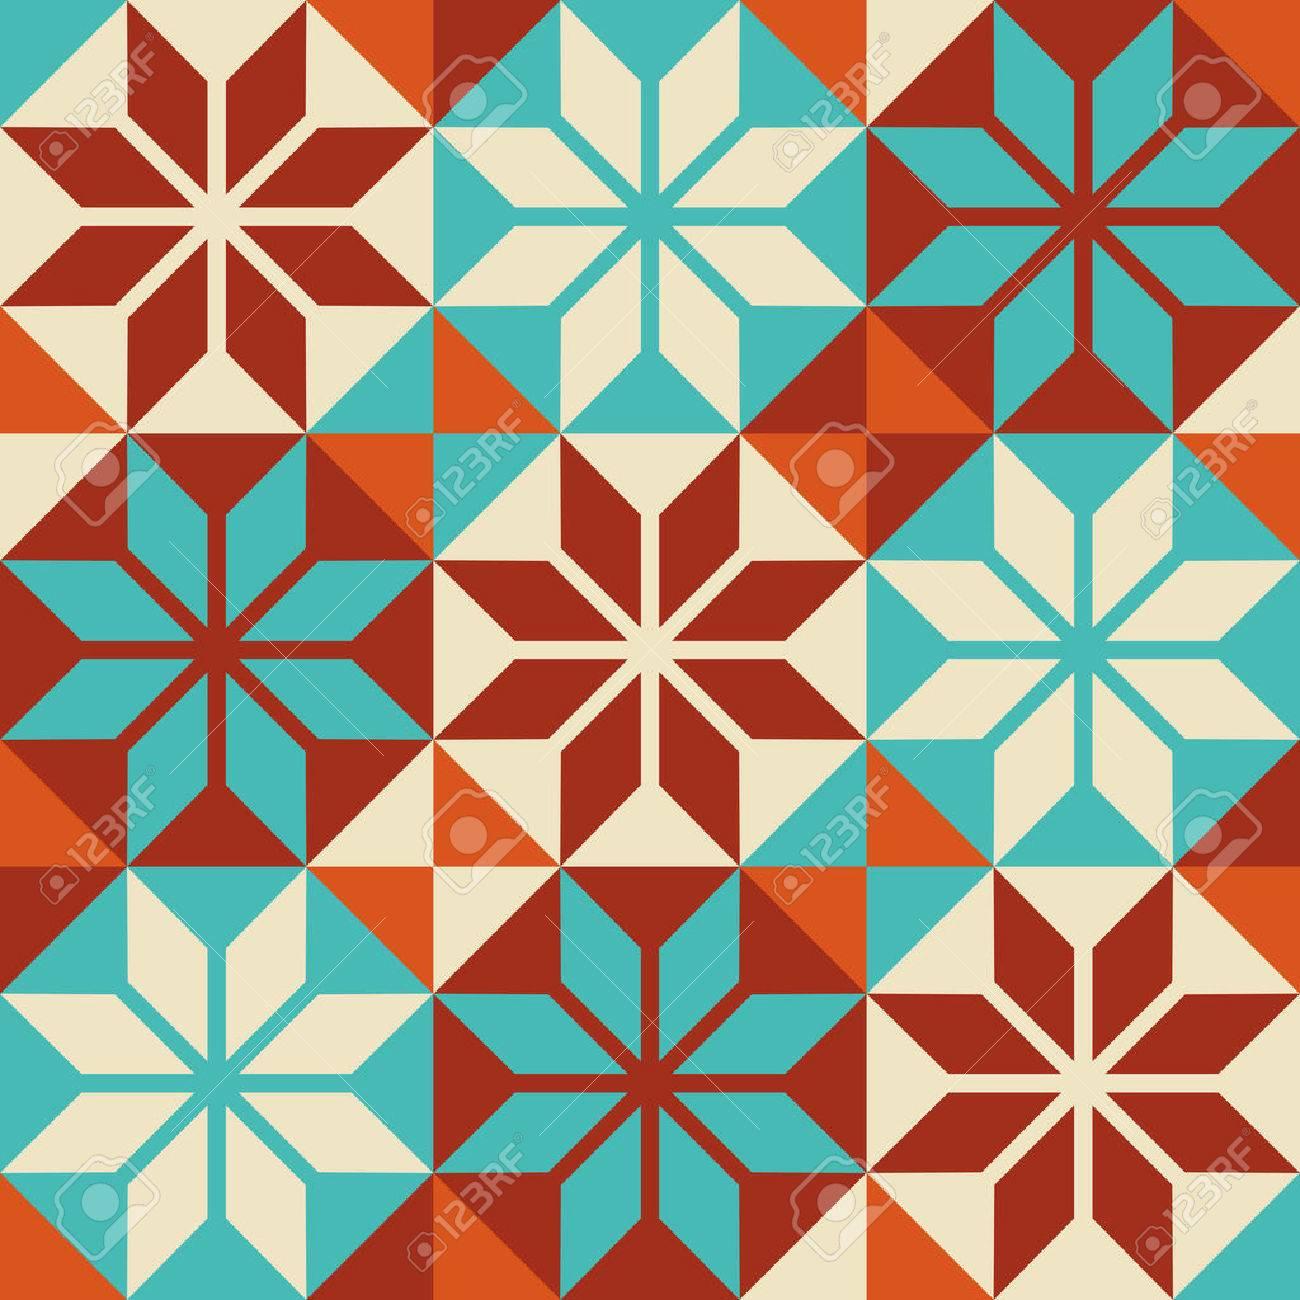 Best Dekorative Geometrische Muster Interieur Images - Ideas ...